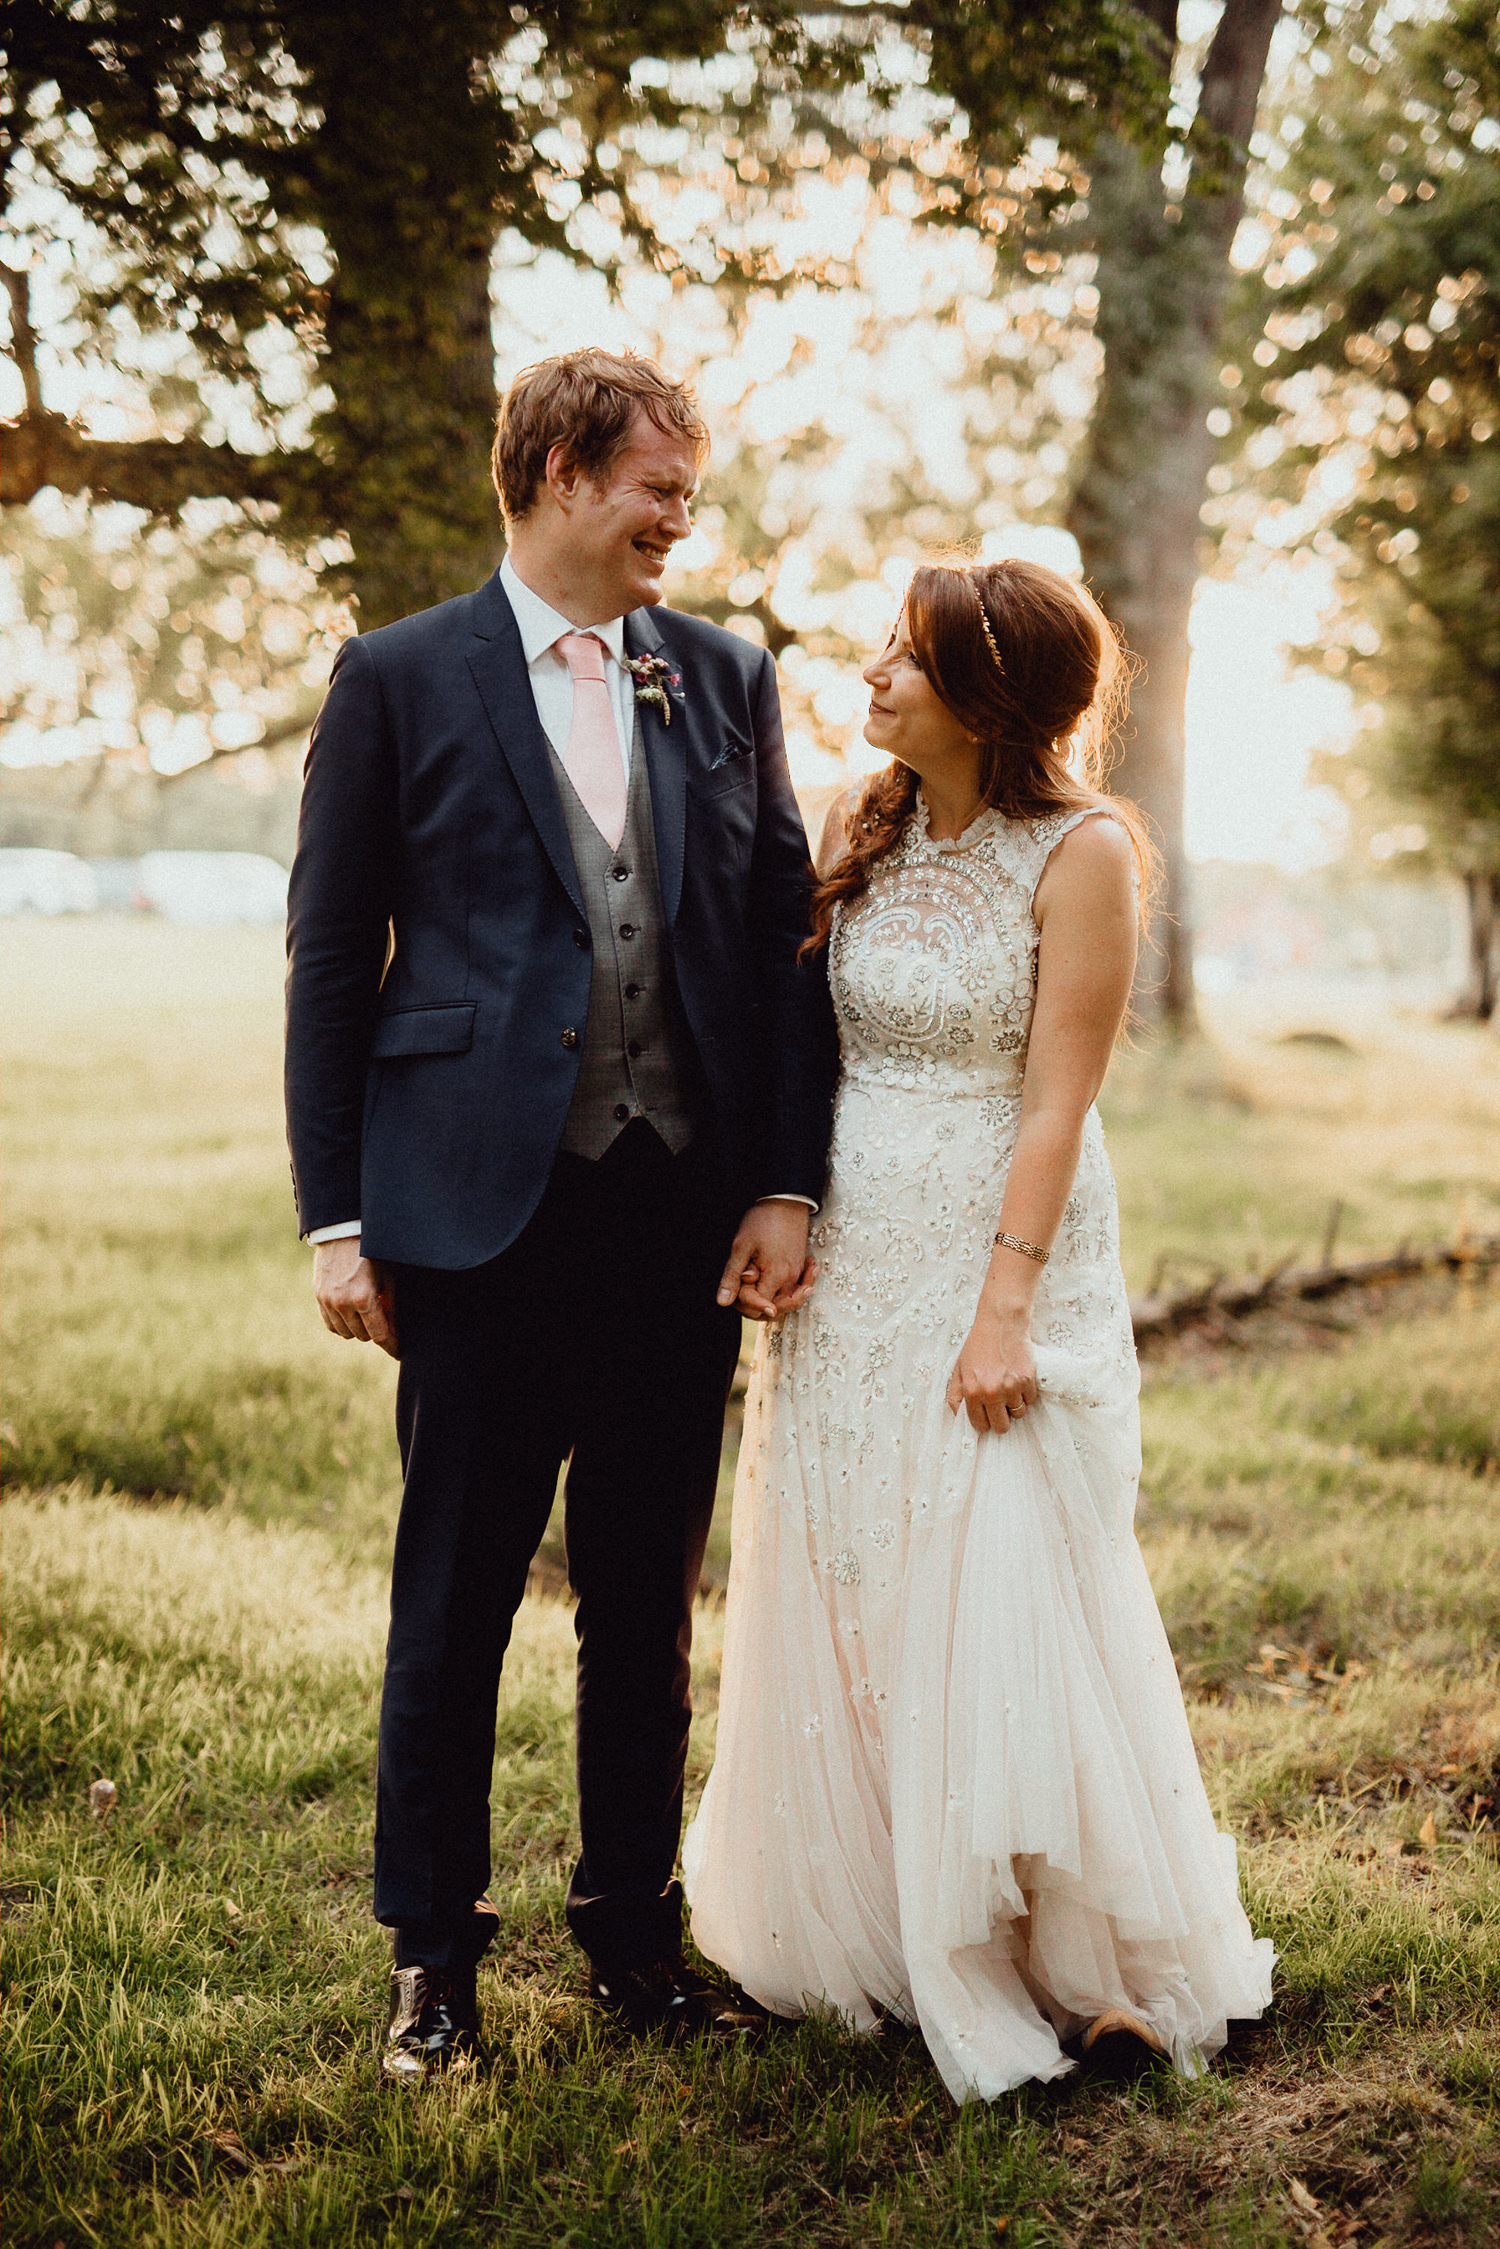 3a4c550a6a470 A Needle Thread wedding dress for a festival wedding - A Needle & Thread  Dress and